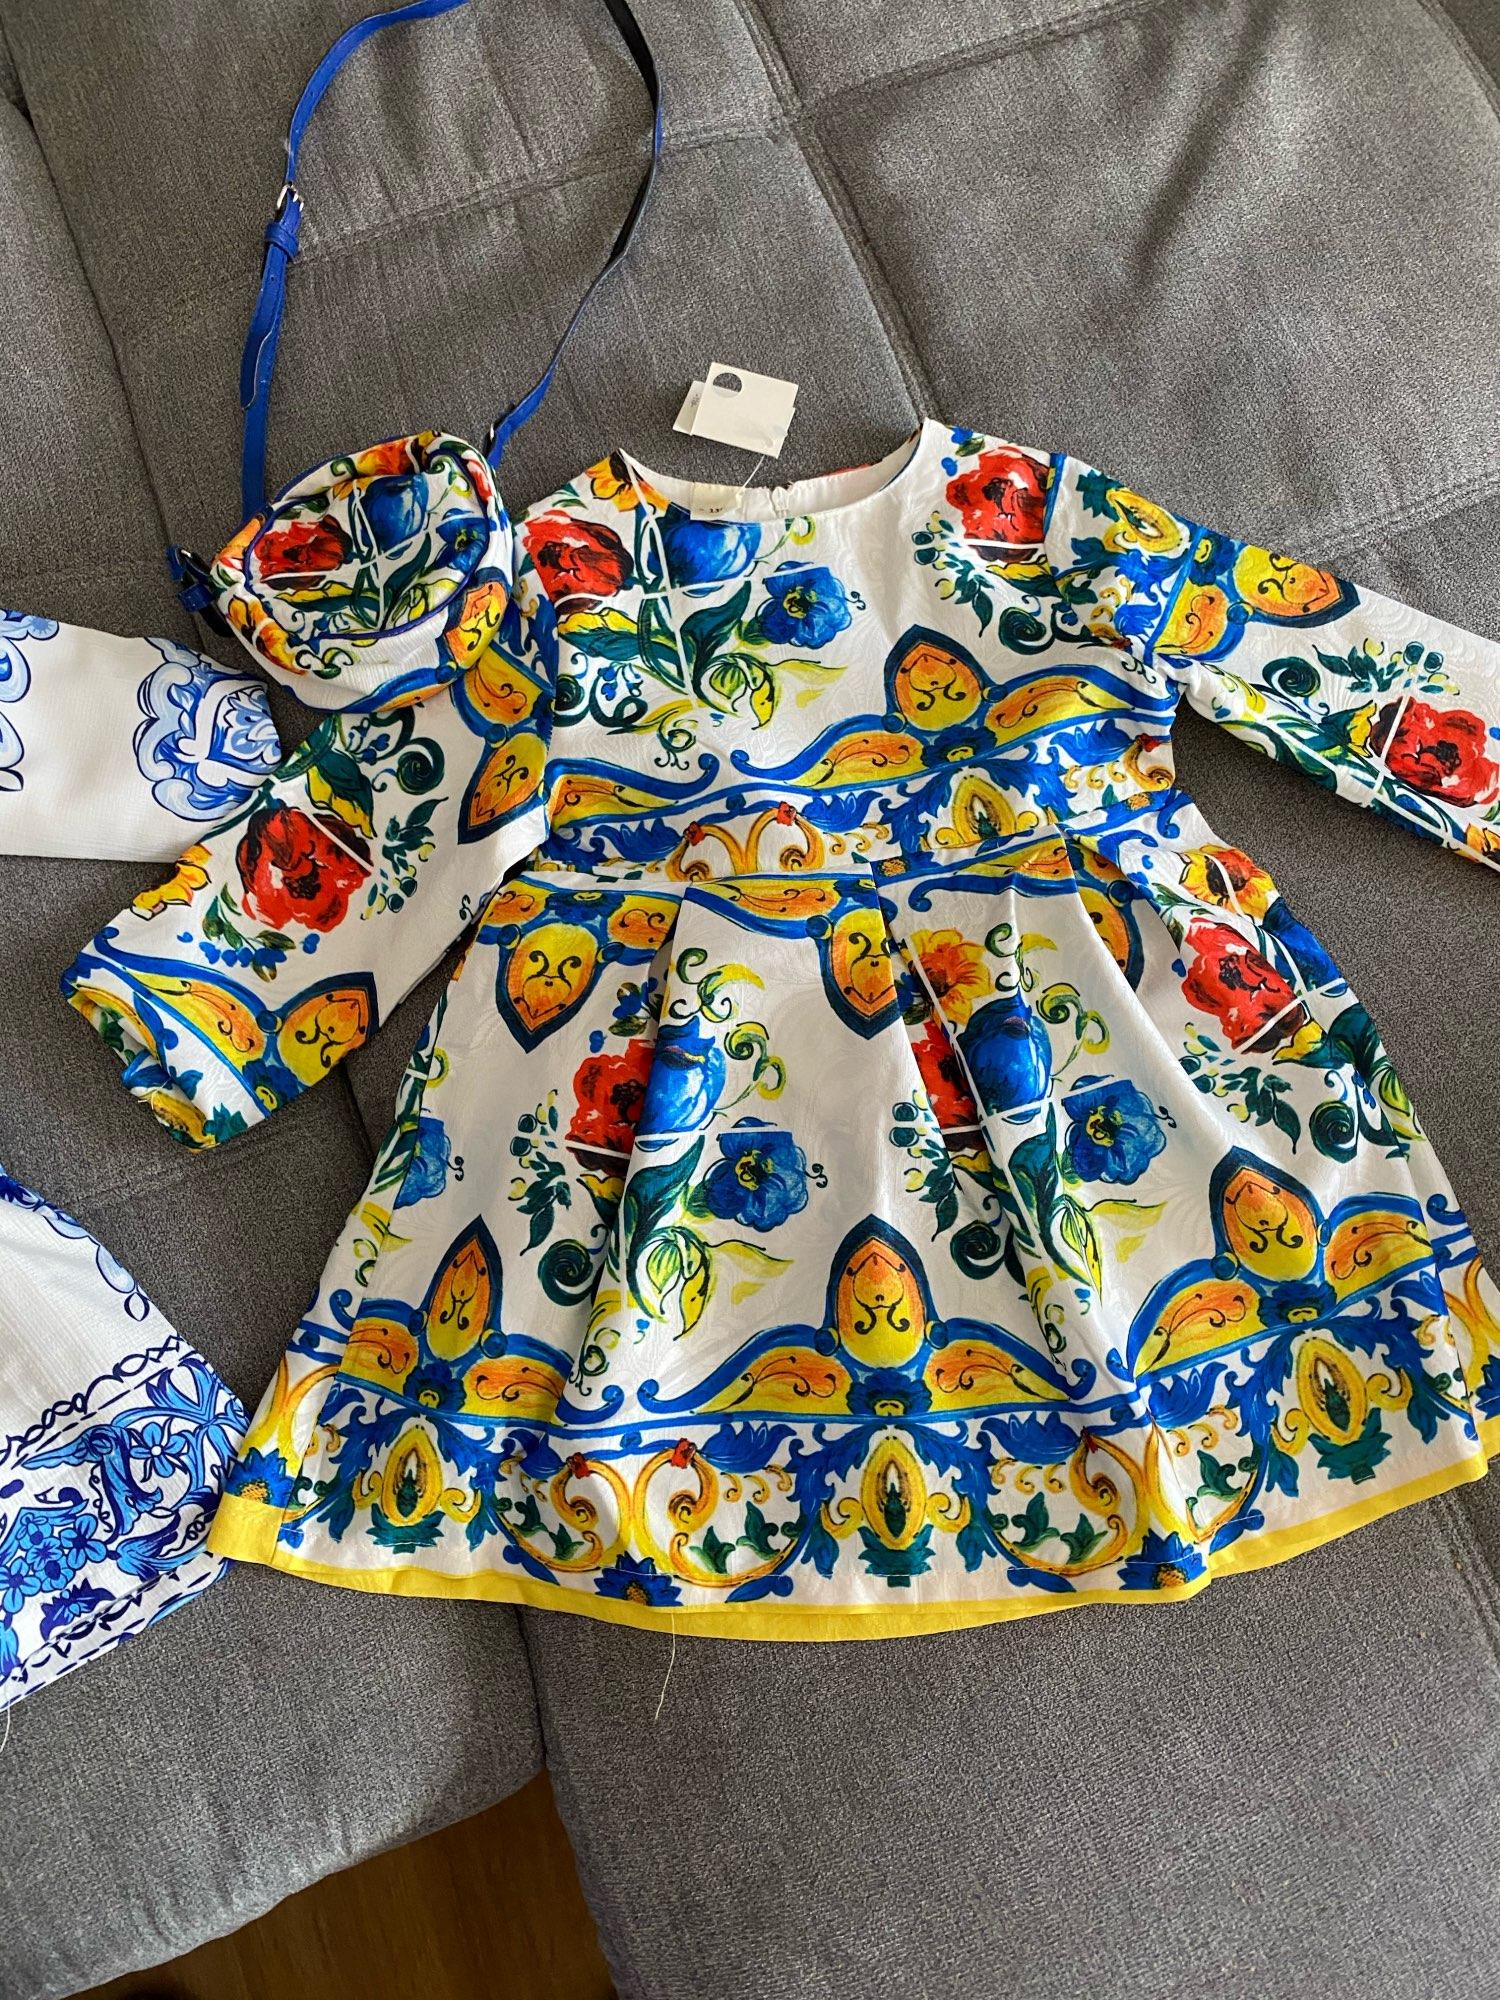 Princess Girls Dress Long Sleeve 2019 Autumn Brand Children Christmas Dress with Bag Printed Kids Dresses for Girls Clothing|princess girl dress|girl dress longbrand girl dress - AliExpress